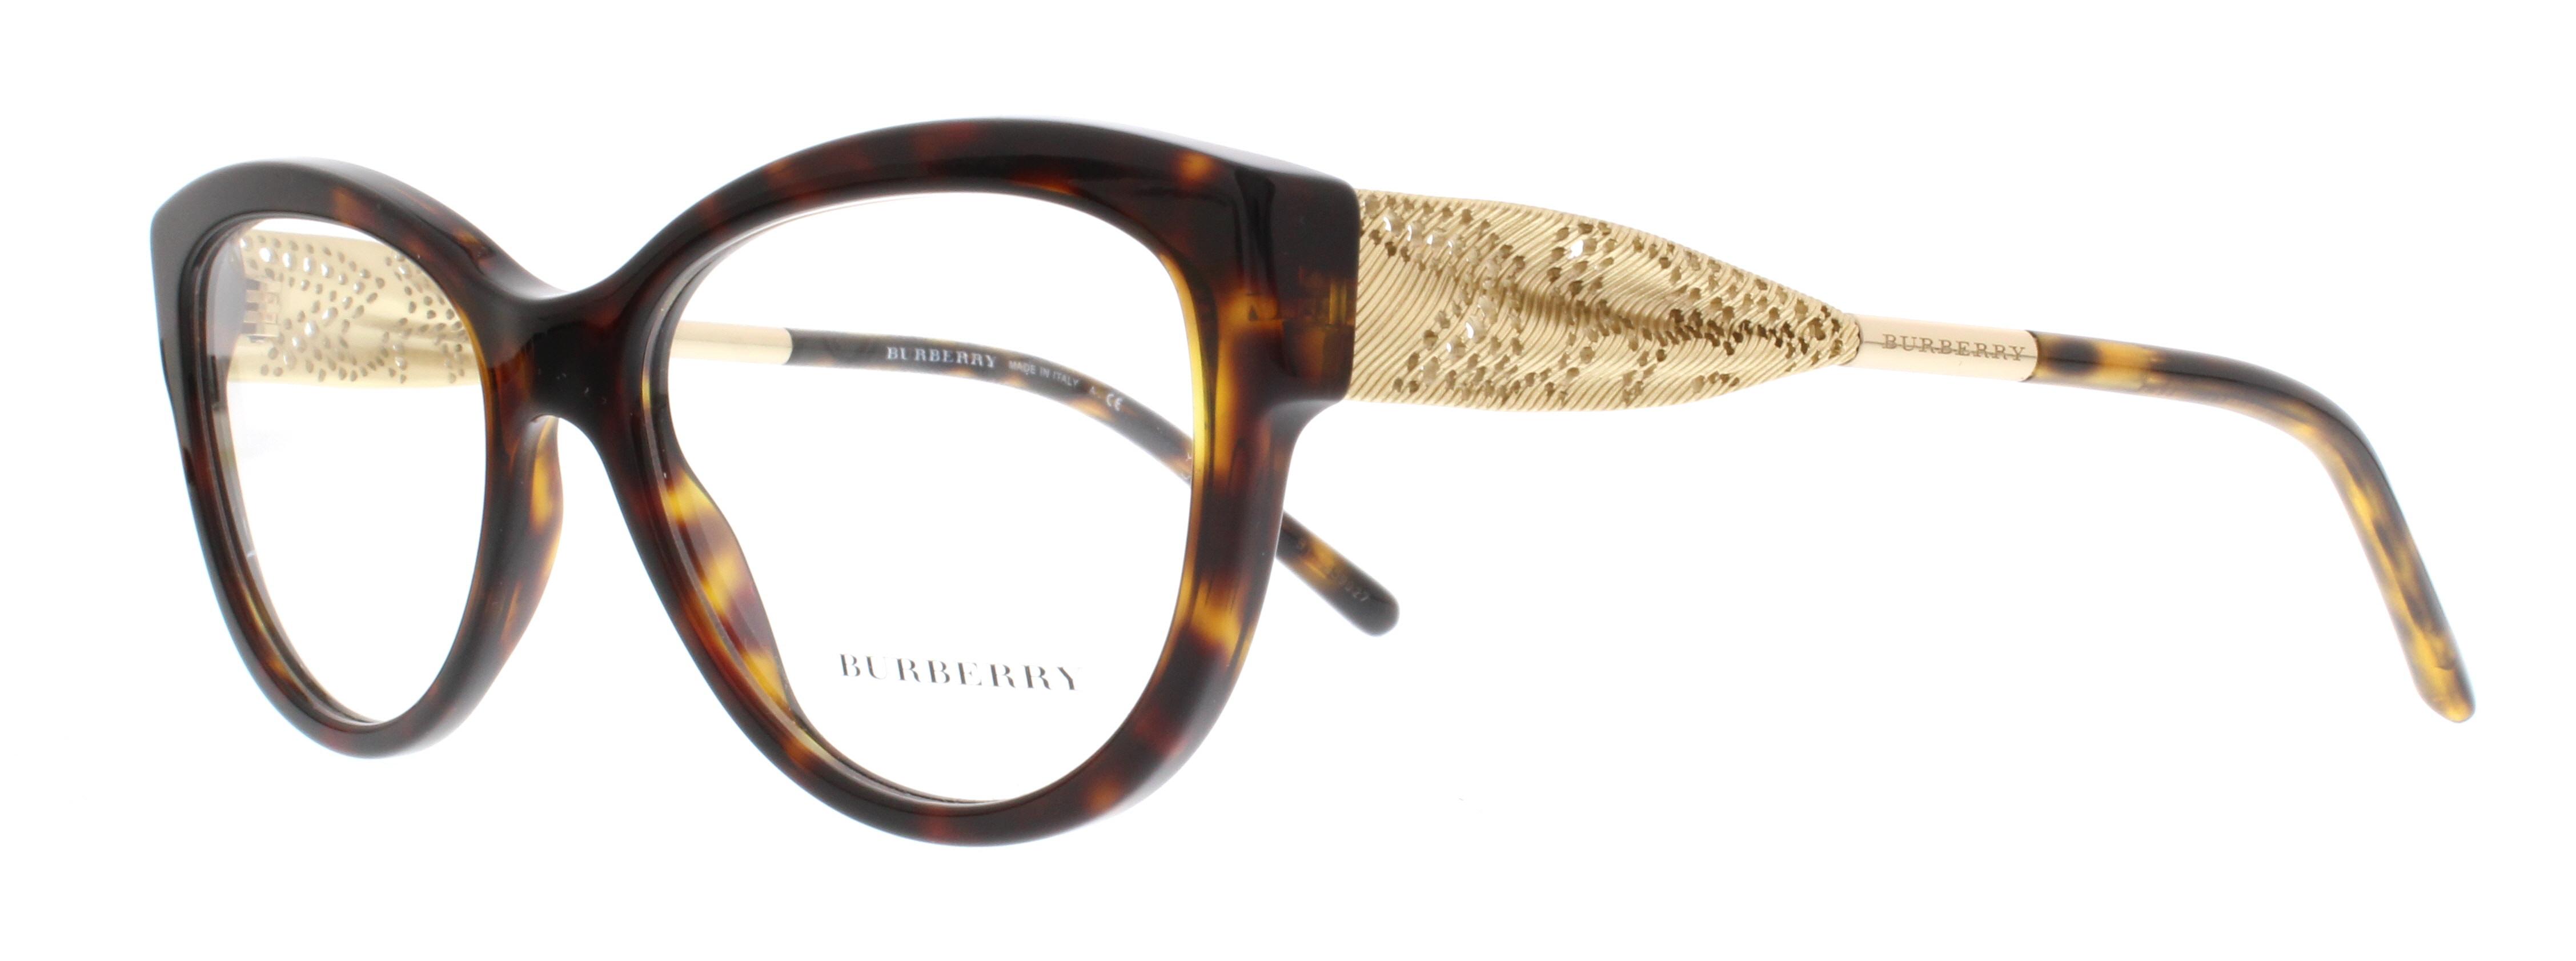 BURBERRY Eyeglasses BE2210 3002 Havana 53MM 8053672487862 | eBay